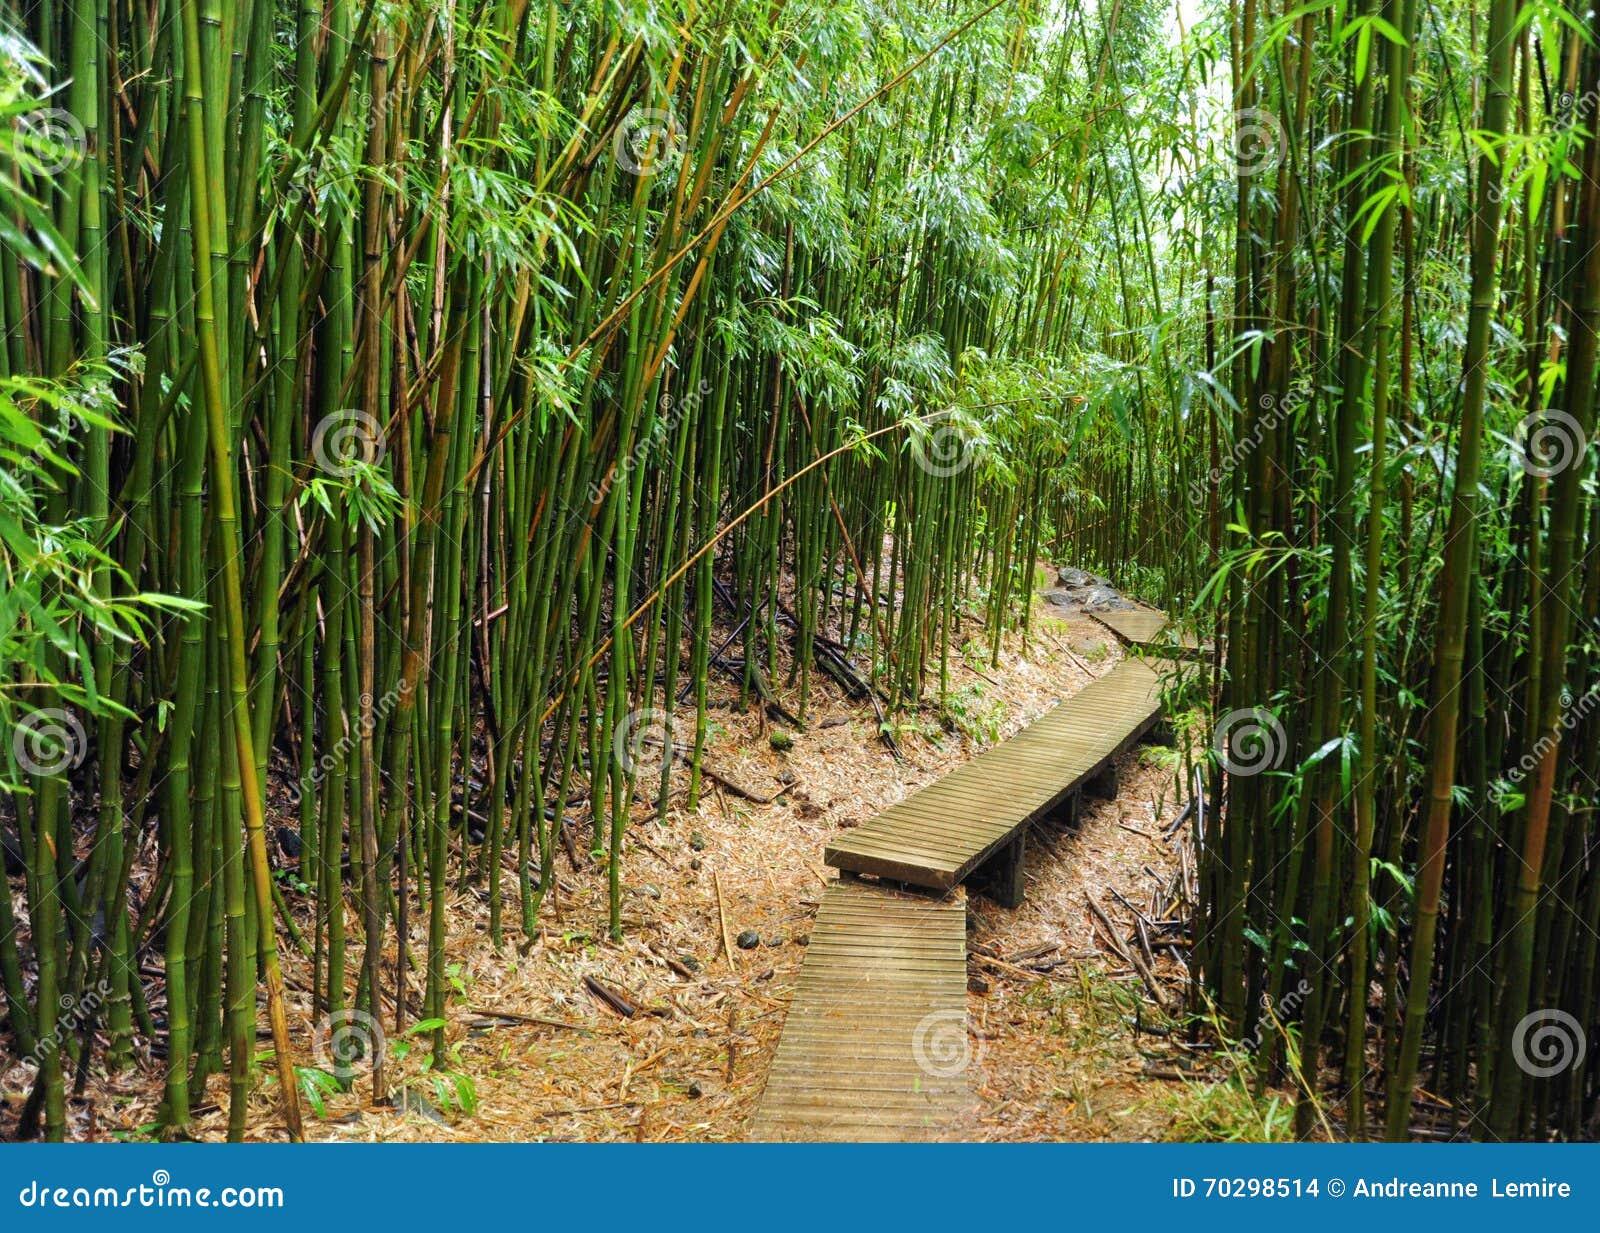 Bambuswald Maui Hawaii Stockfoto Bild Von Ozean Maui 70298514